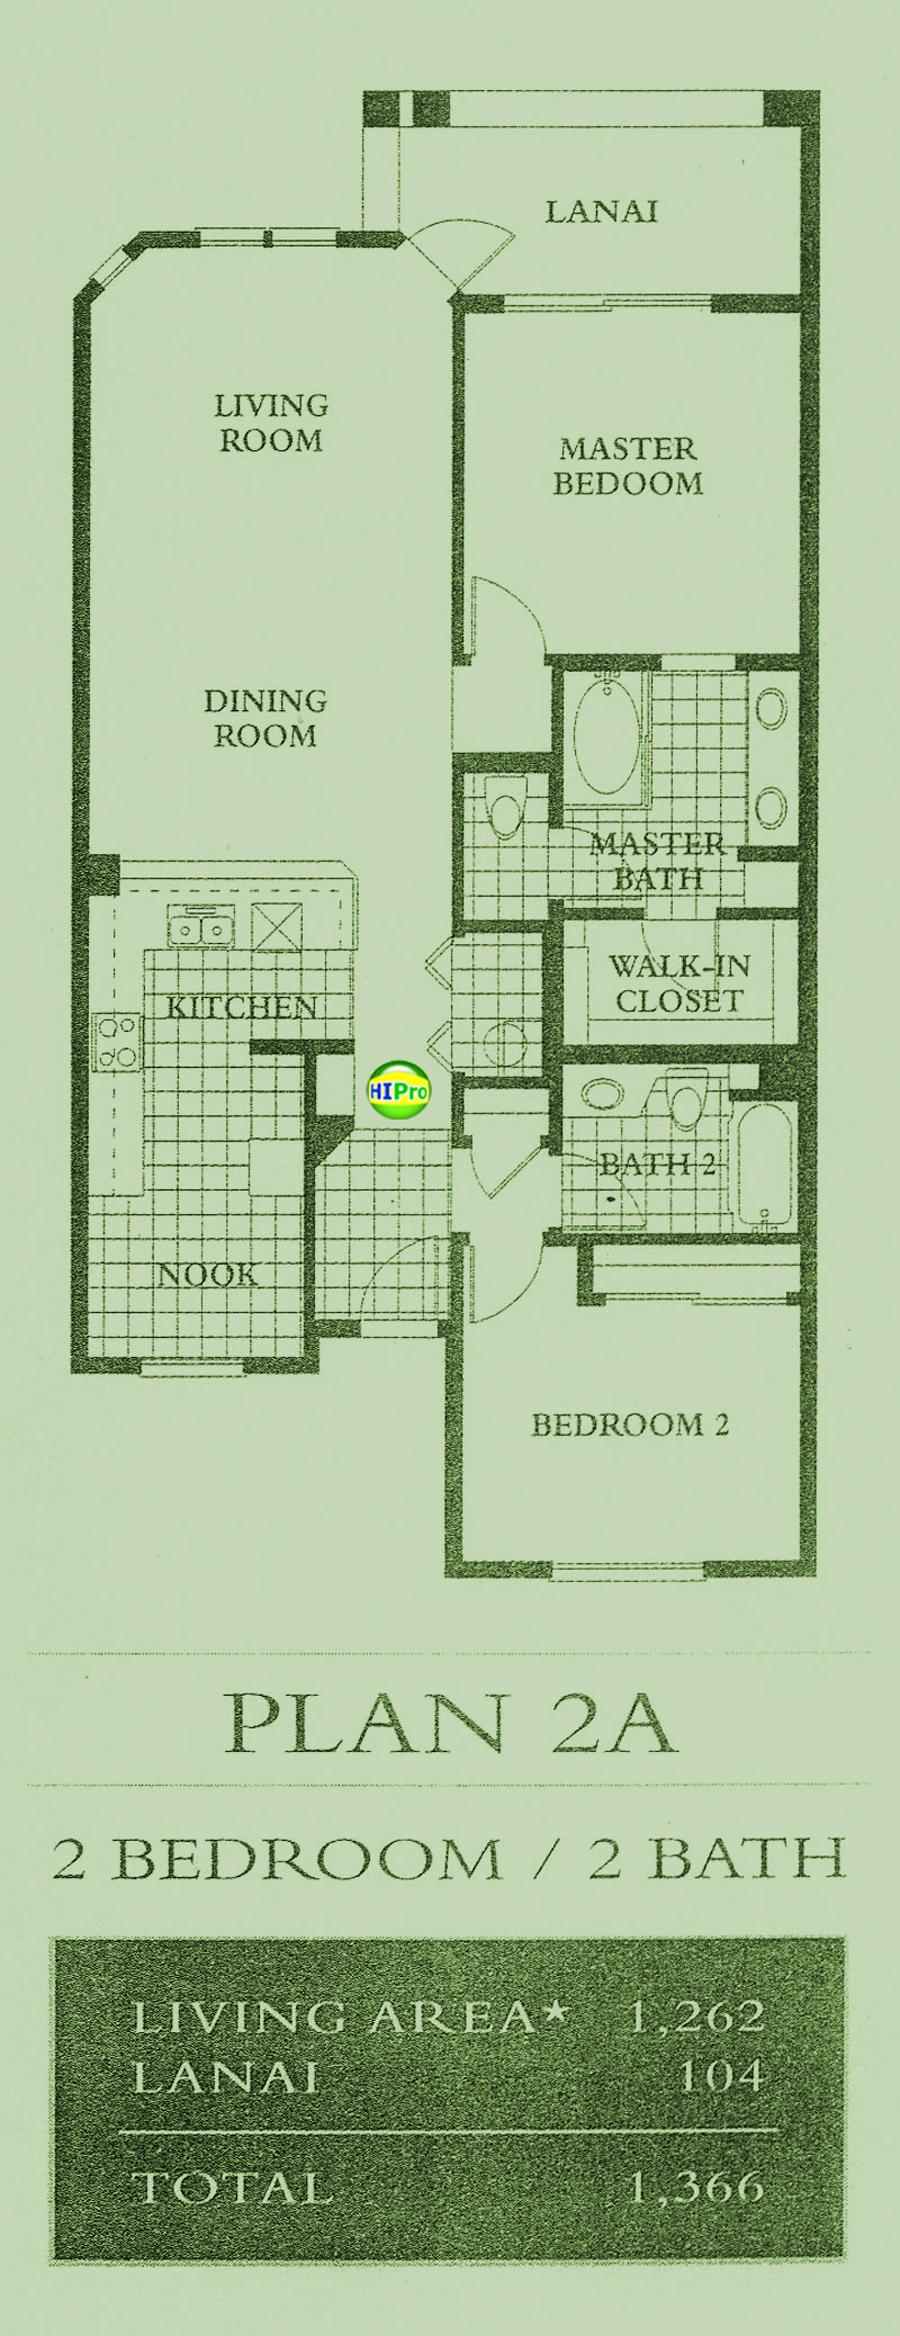 Tower Residences